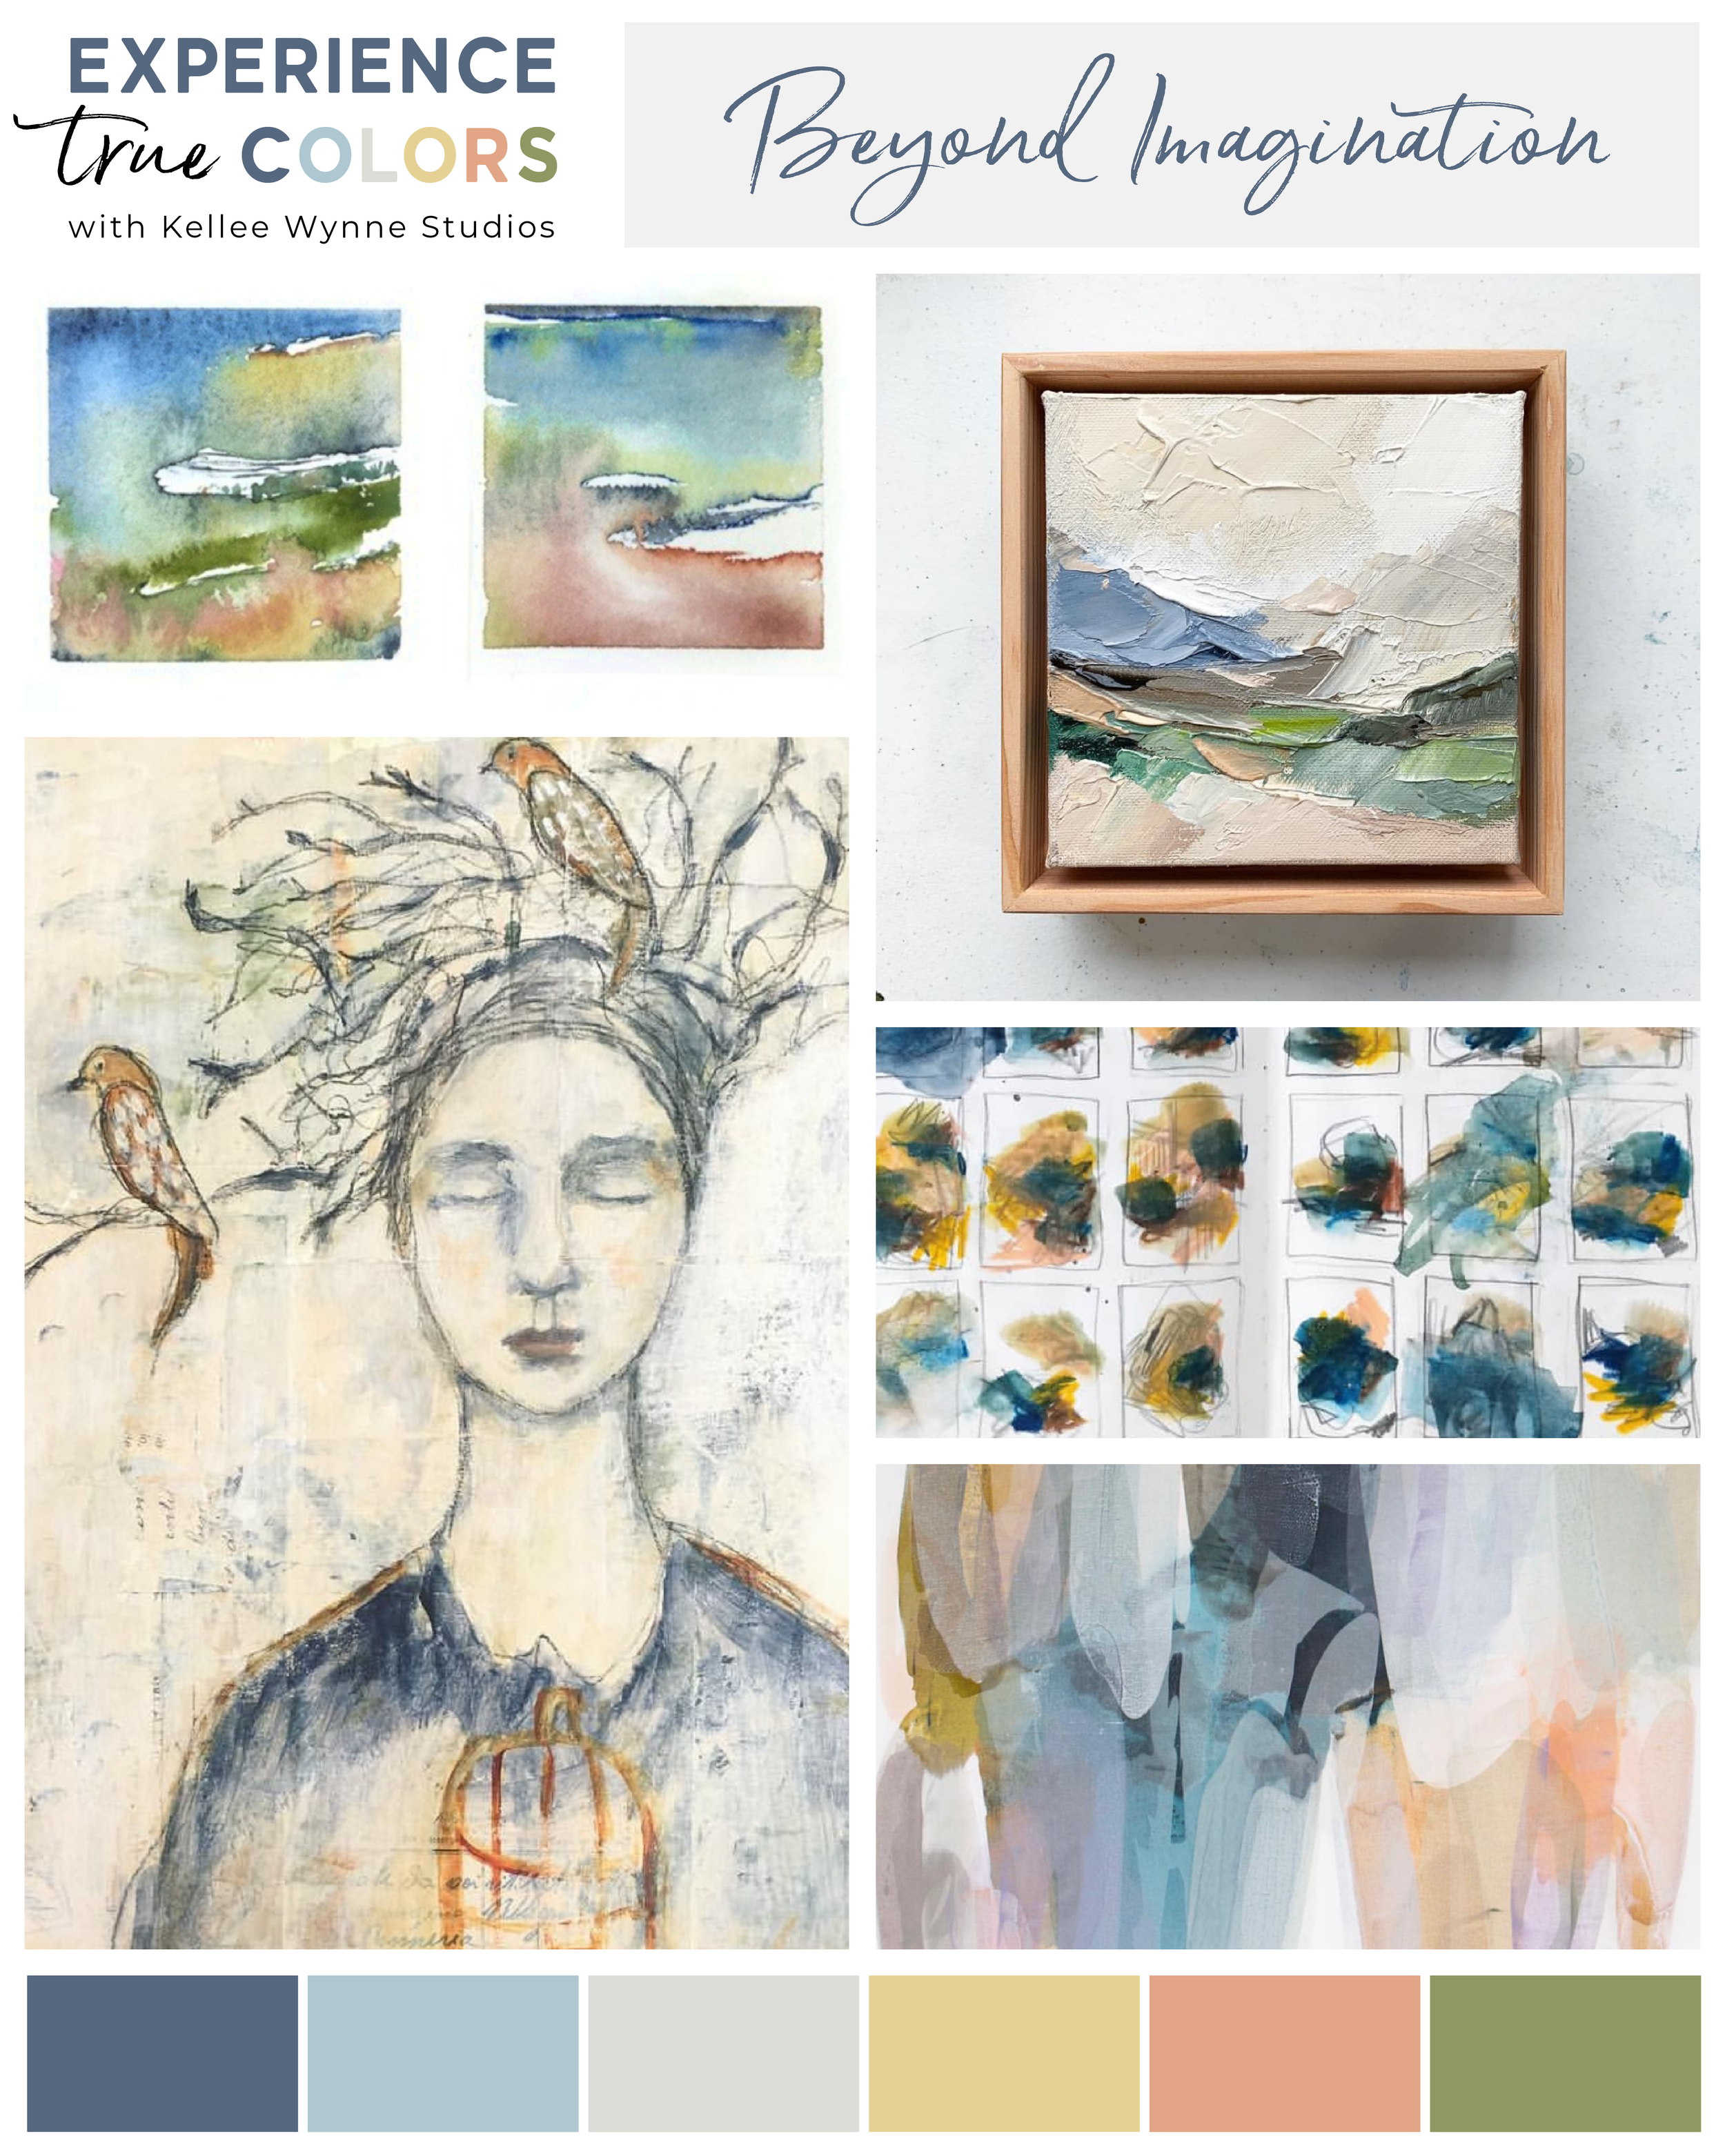 Beyond Imagination Palette 3 for True Colors Art Program with Kellee Wynne Studios.png